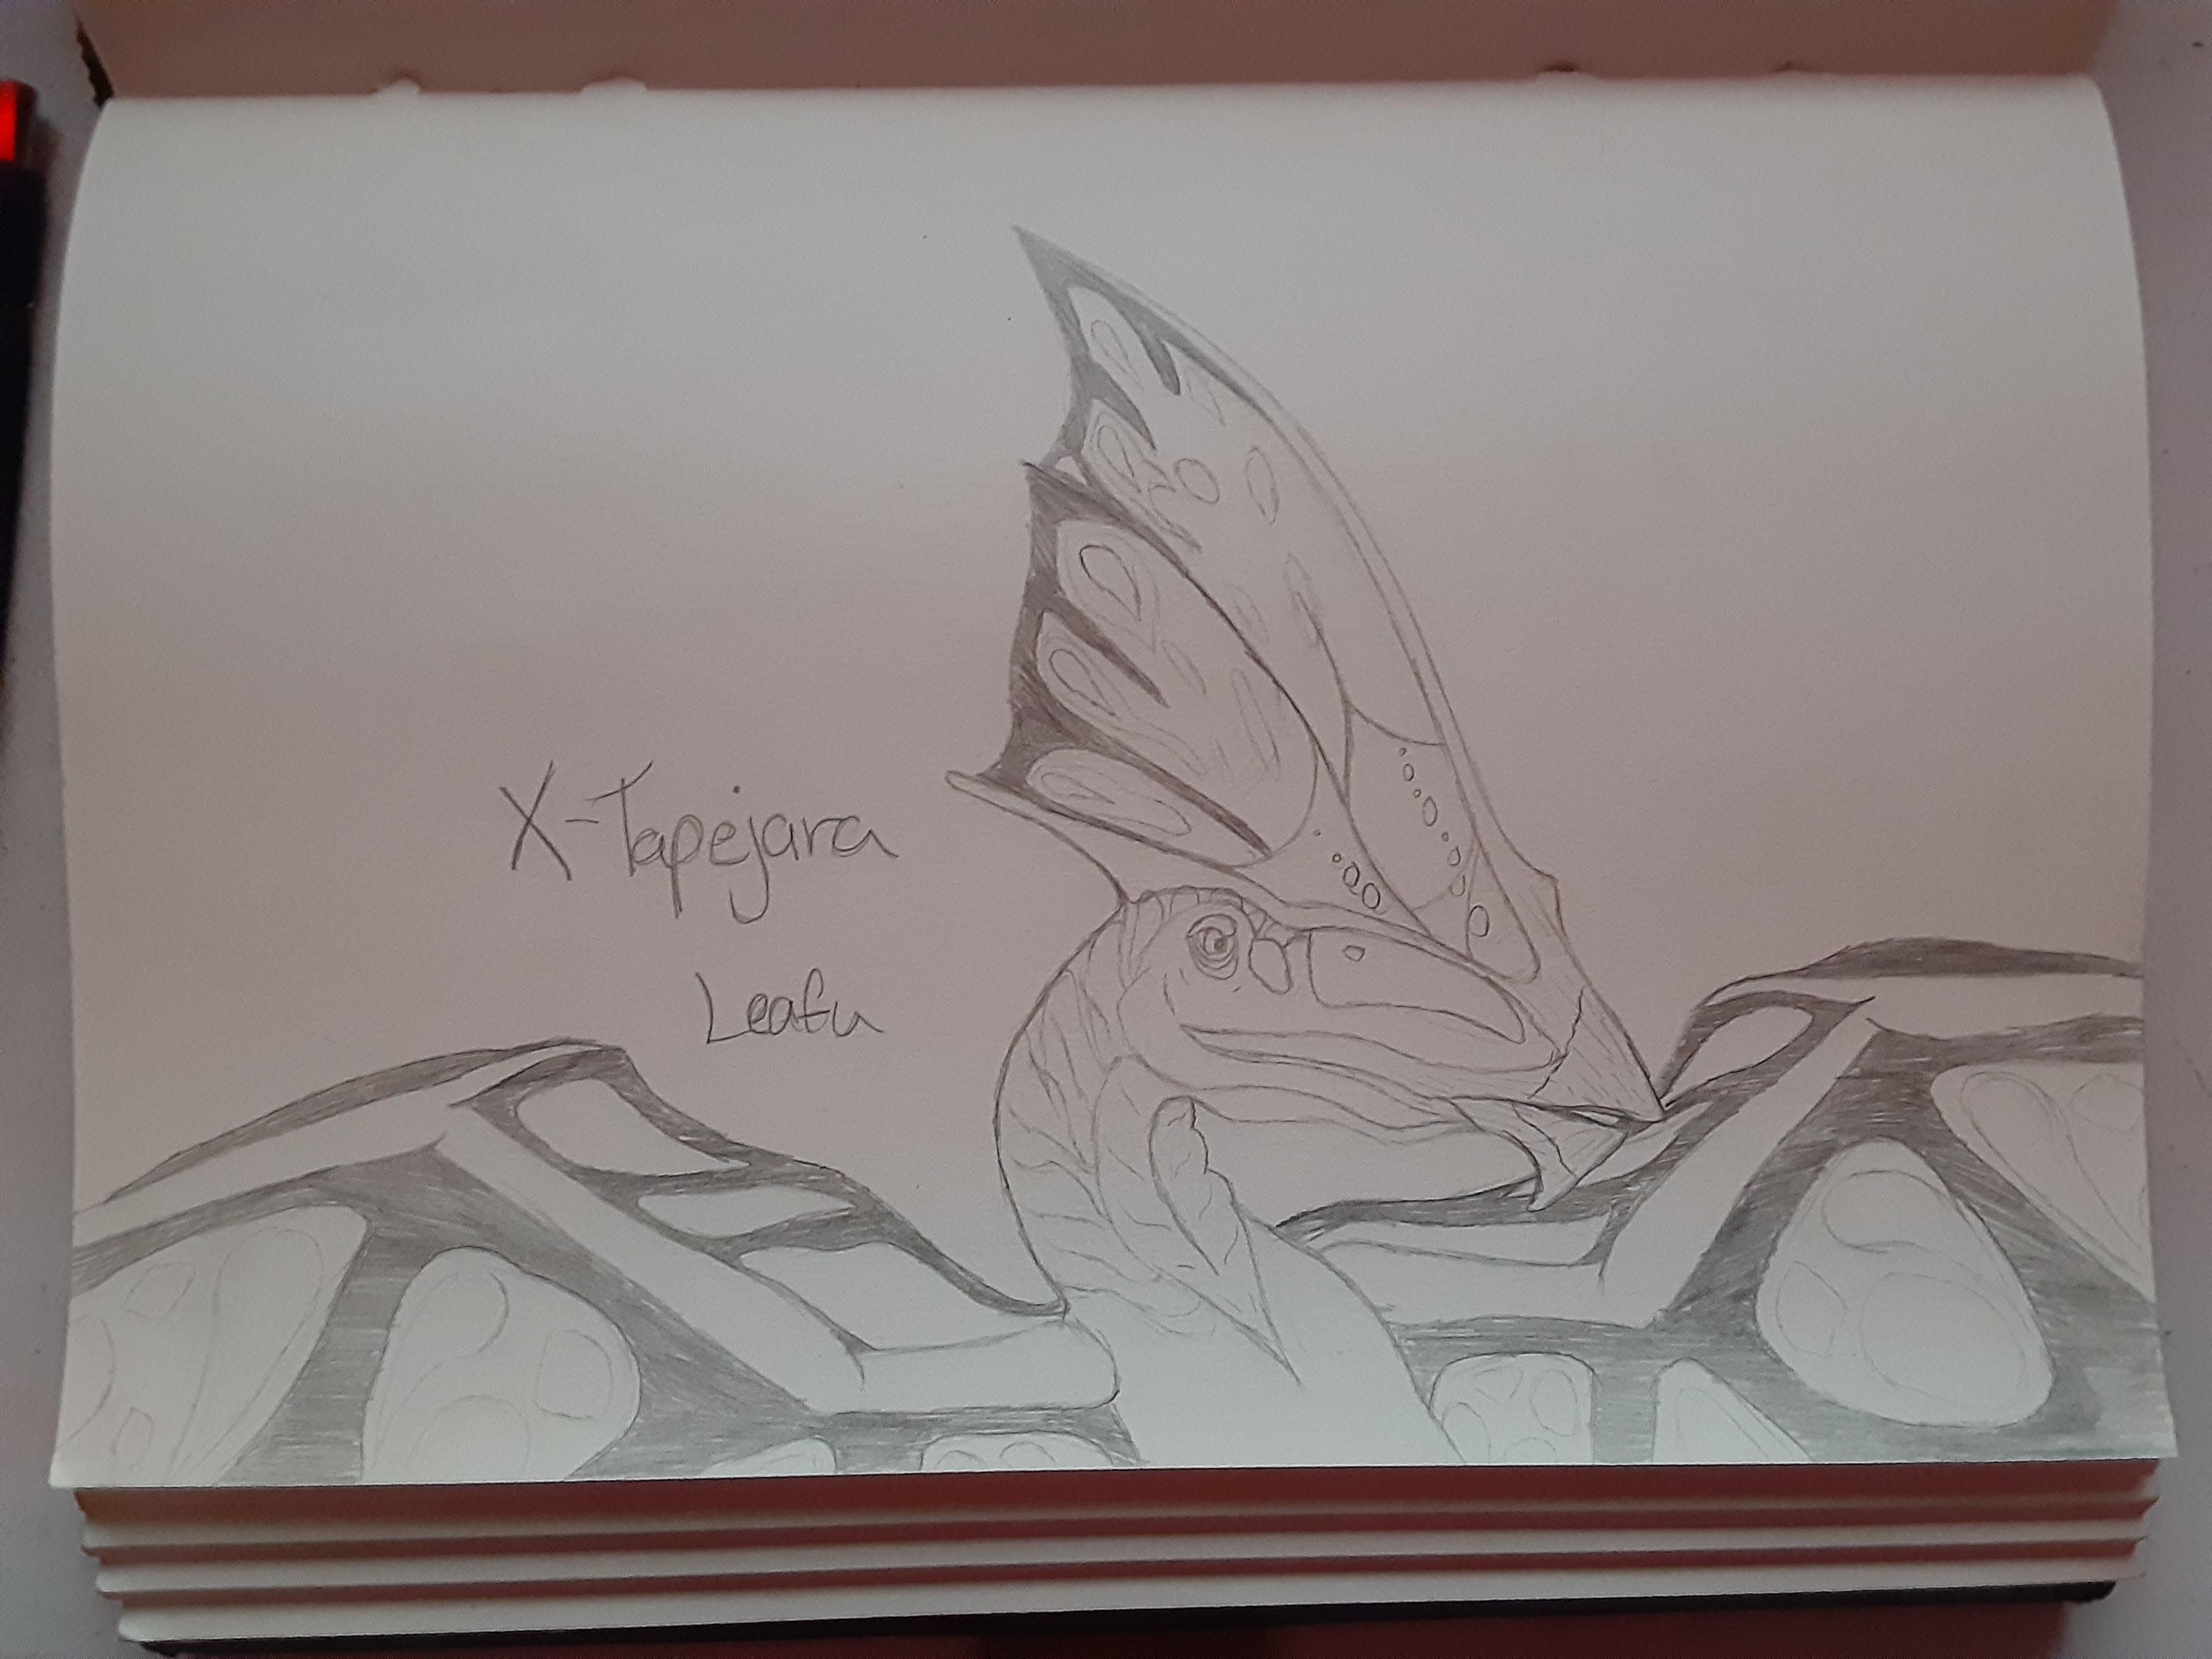 X Tapejara Ark Survival Evolved By Aerithedrgn On Deviantart Here's my ark tapejarra artwork for you to see! x tapejara ark survival evolved by